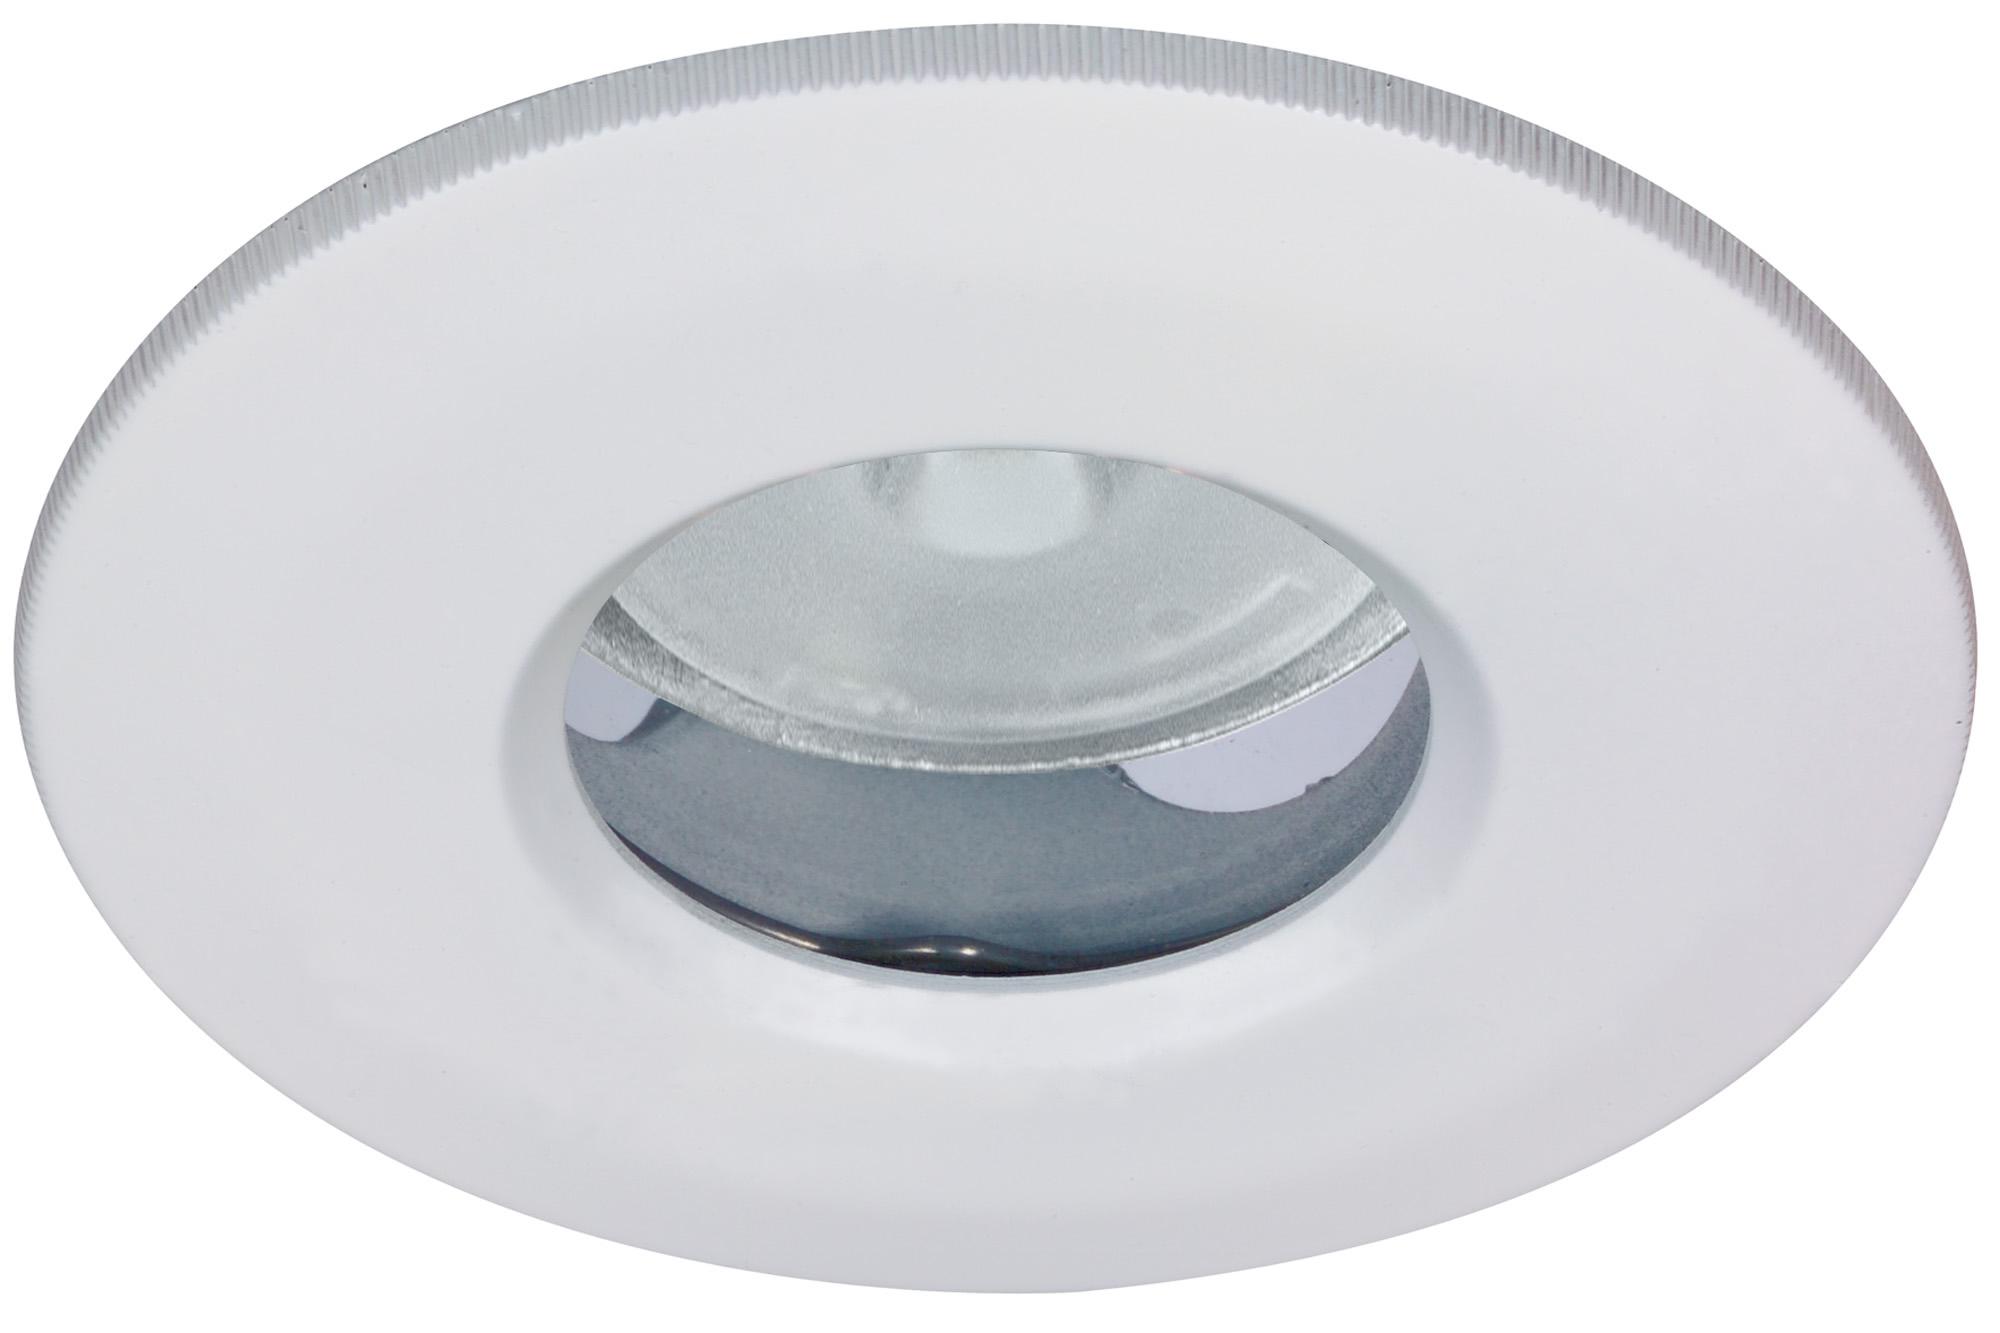 Paulmann. 99460 Светильник встраиваемый Profi набор IP65 LED 3x4W GU5,3 бел.